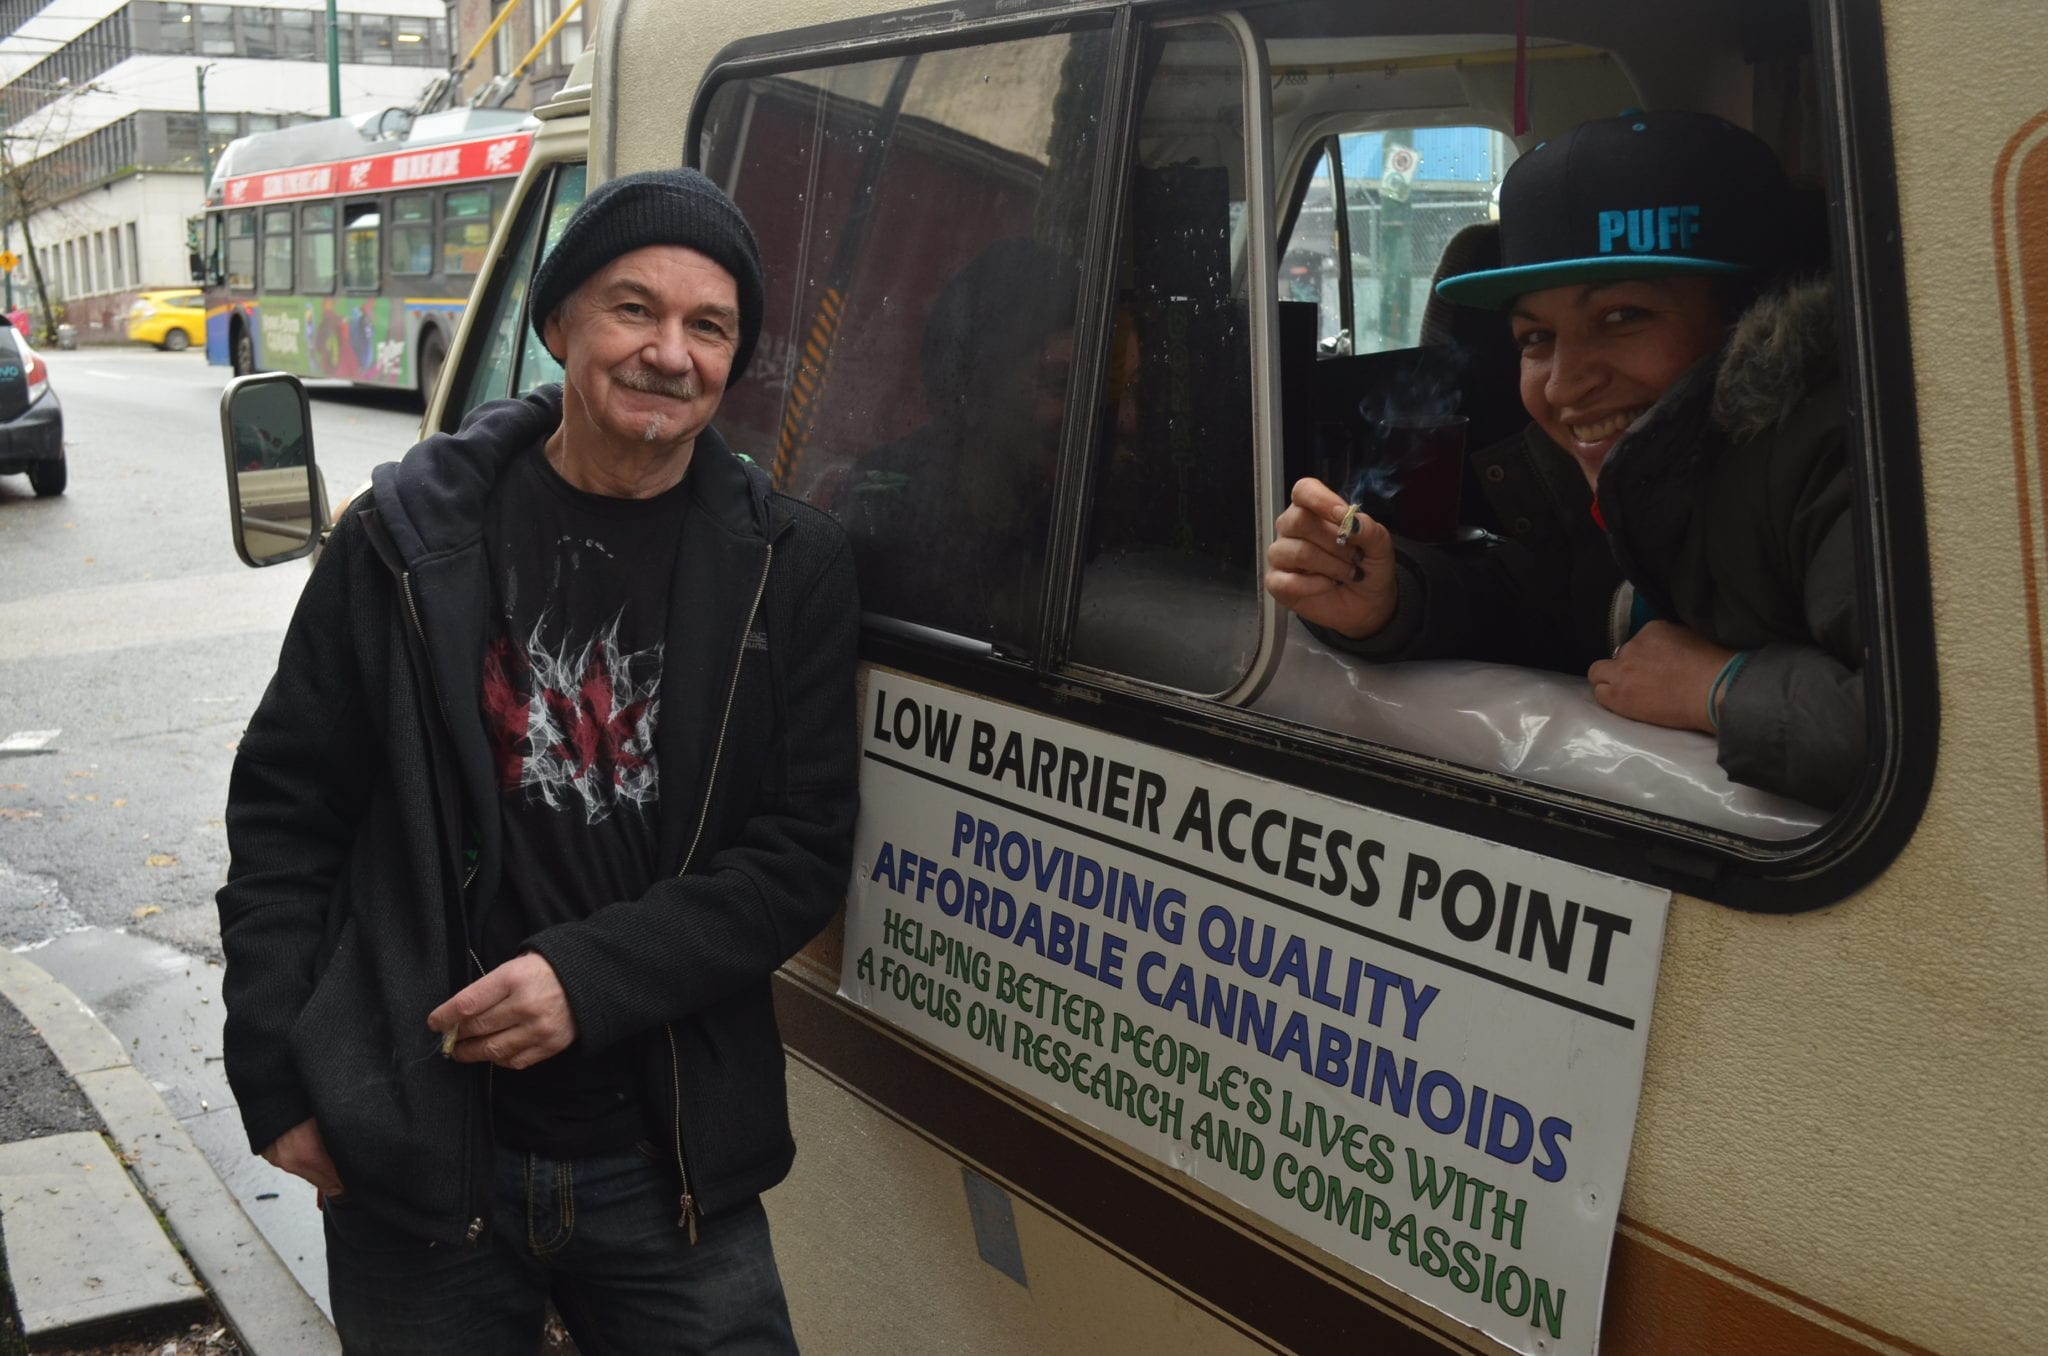 BC health officials lukewarm on cannabis as harm reduction - doobie van